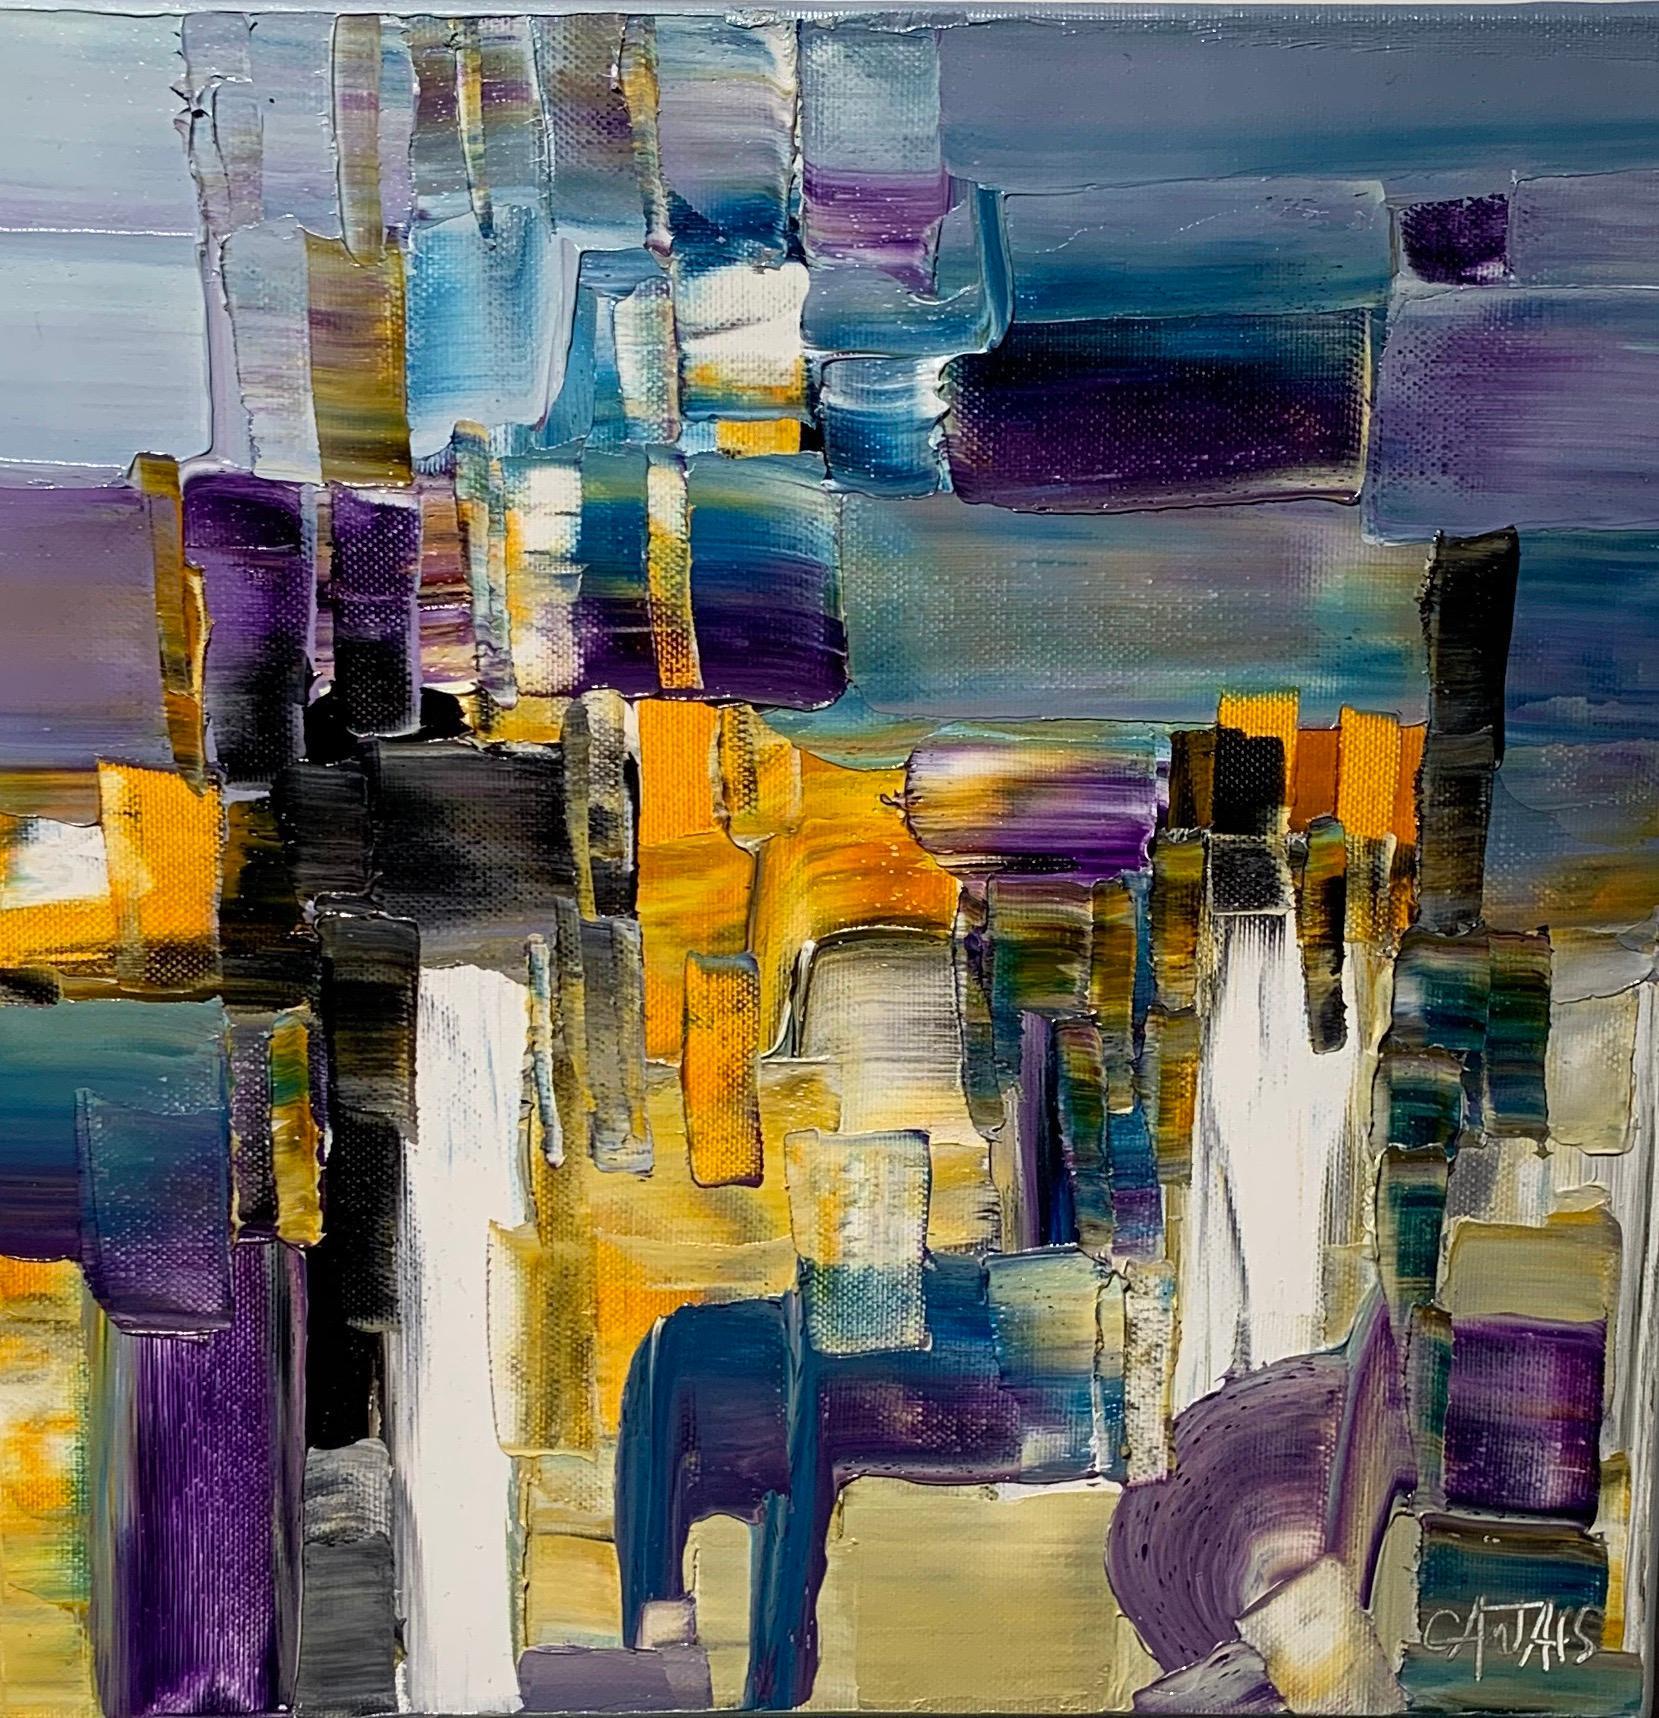 Composition abstr - Bruno Cantais - Oil on canvas - Modern art - 21 th century